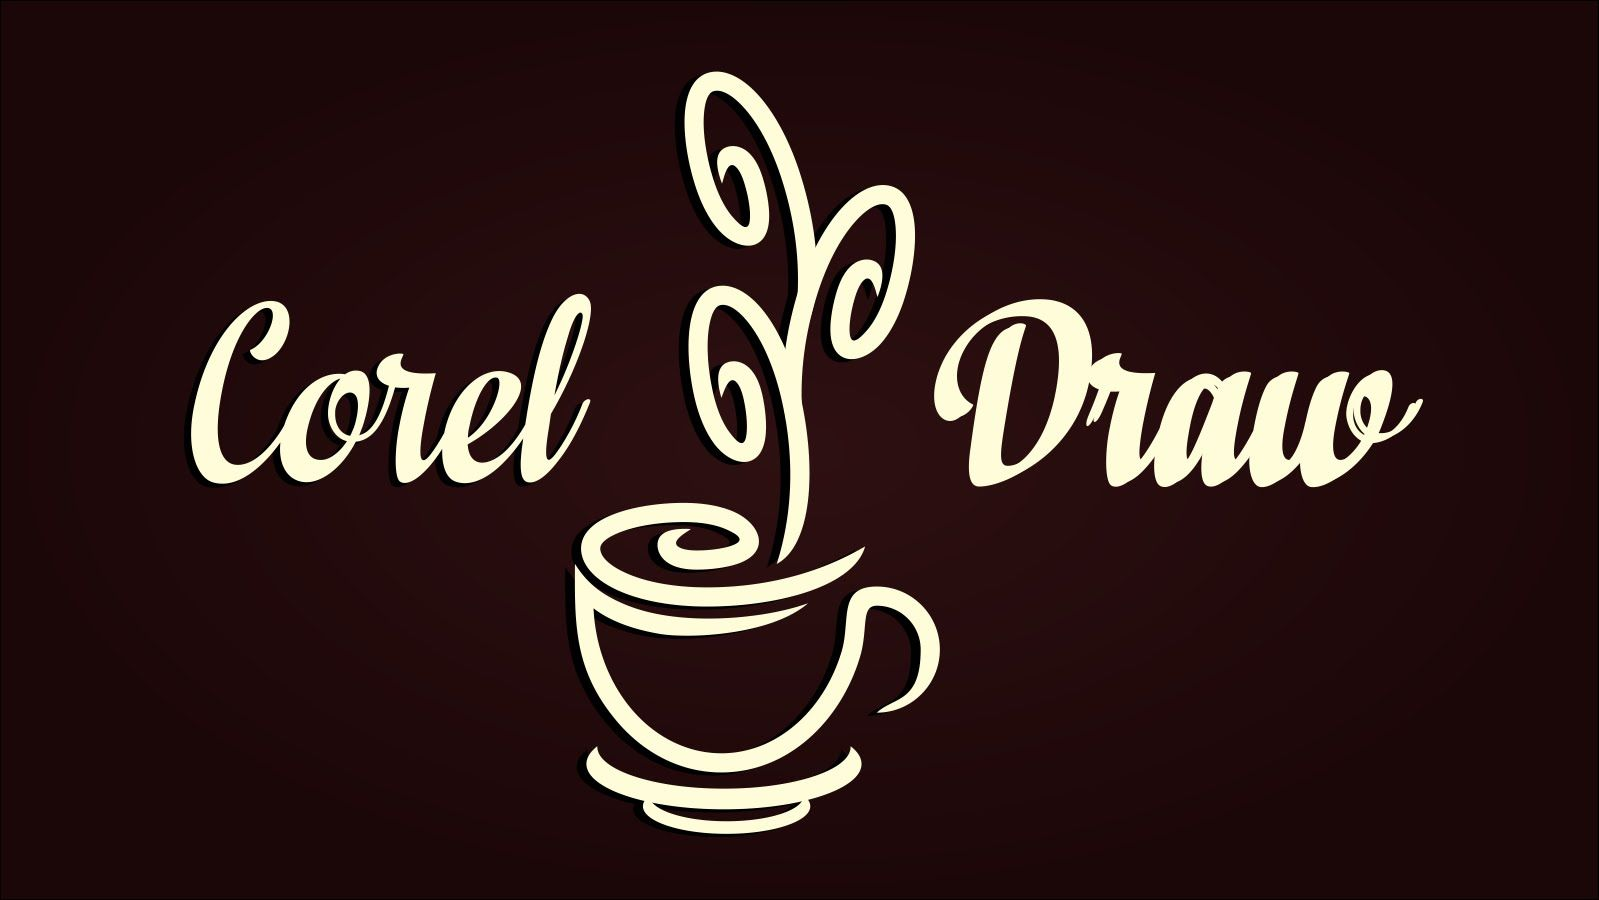 Poster design using coreldraw tutorial - Coreldraw X8 Simple Corel Draw Logo Design Tutorial